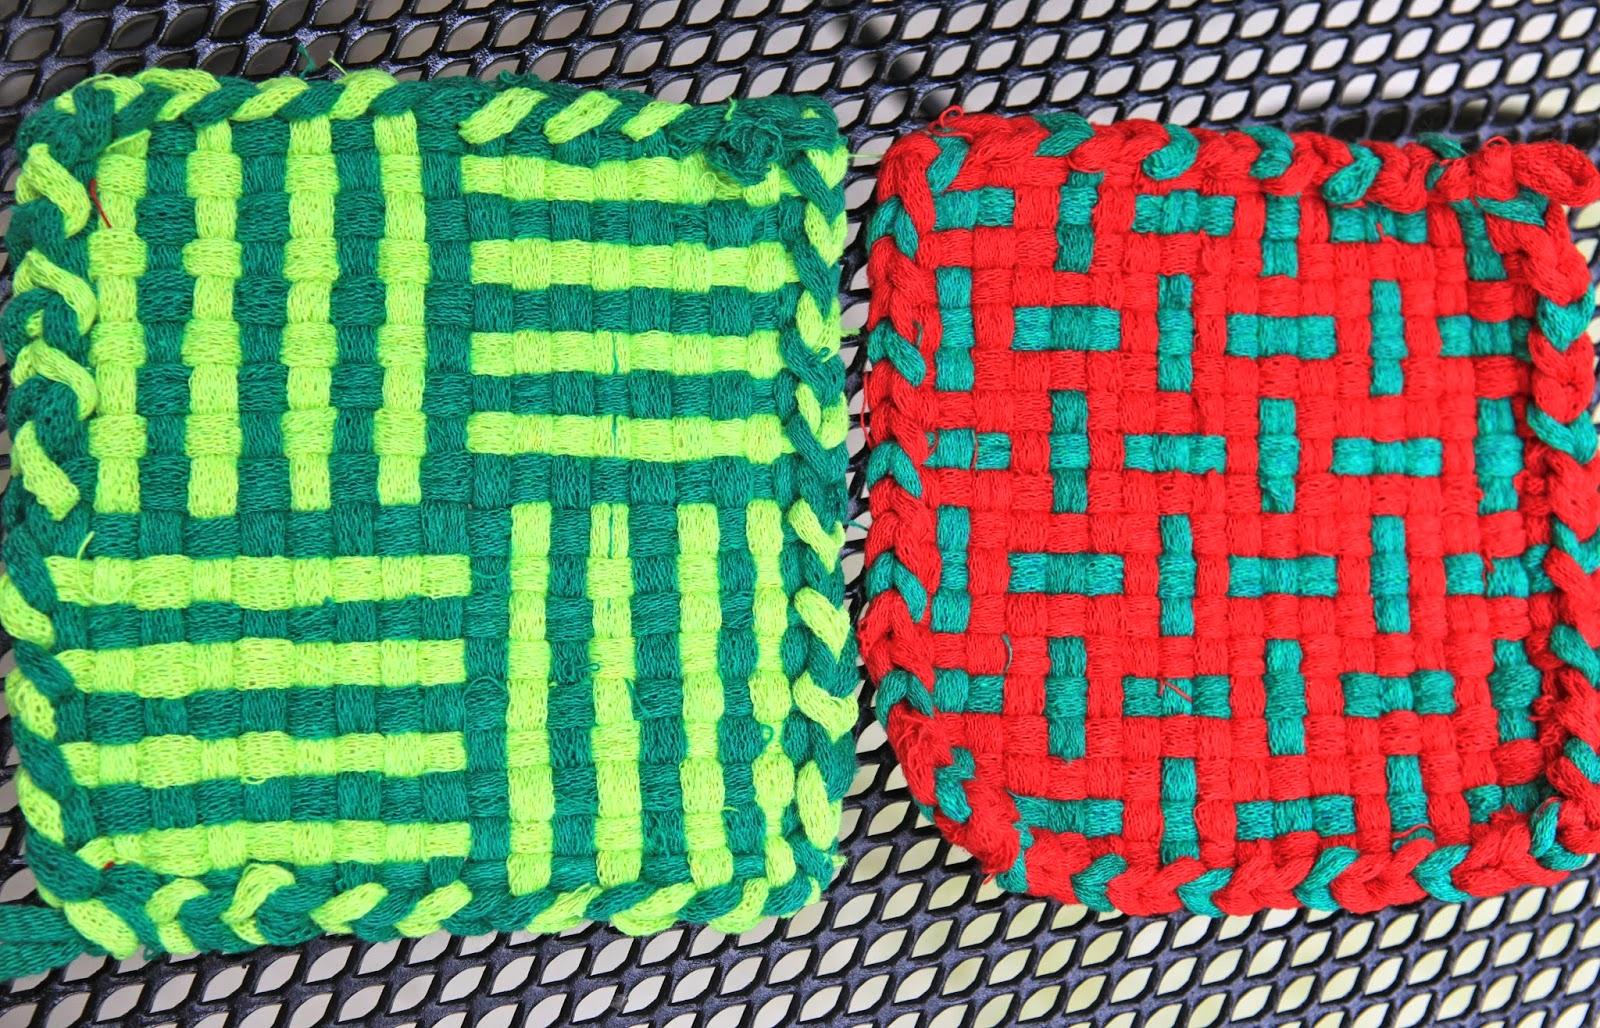 Potholder Loom Patterns Custom Design Ideas